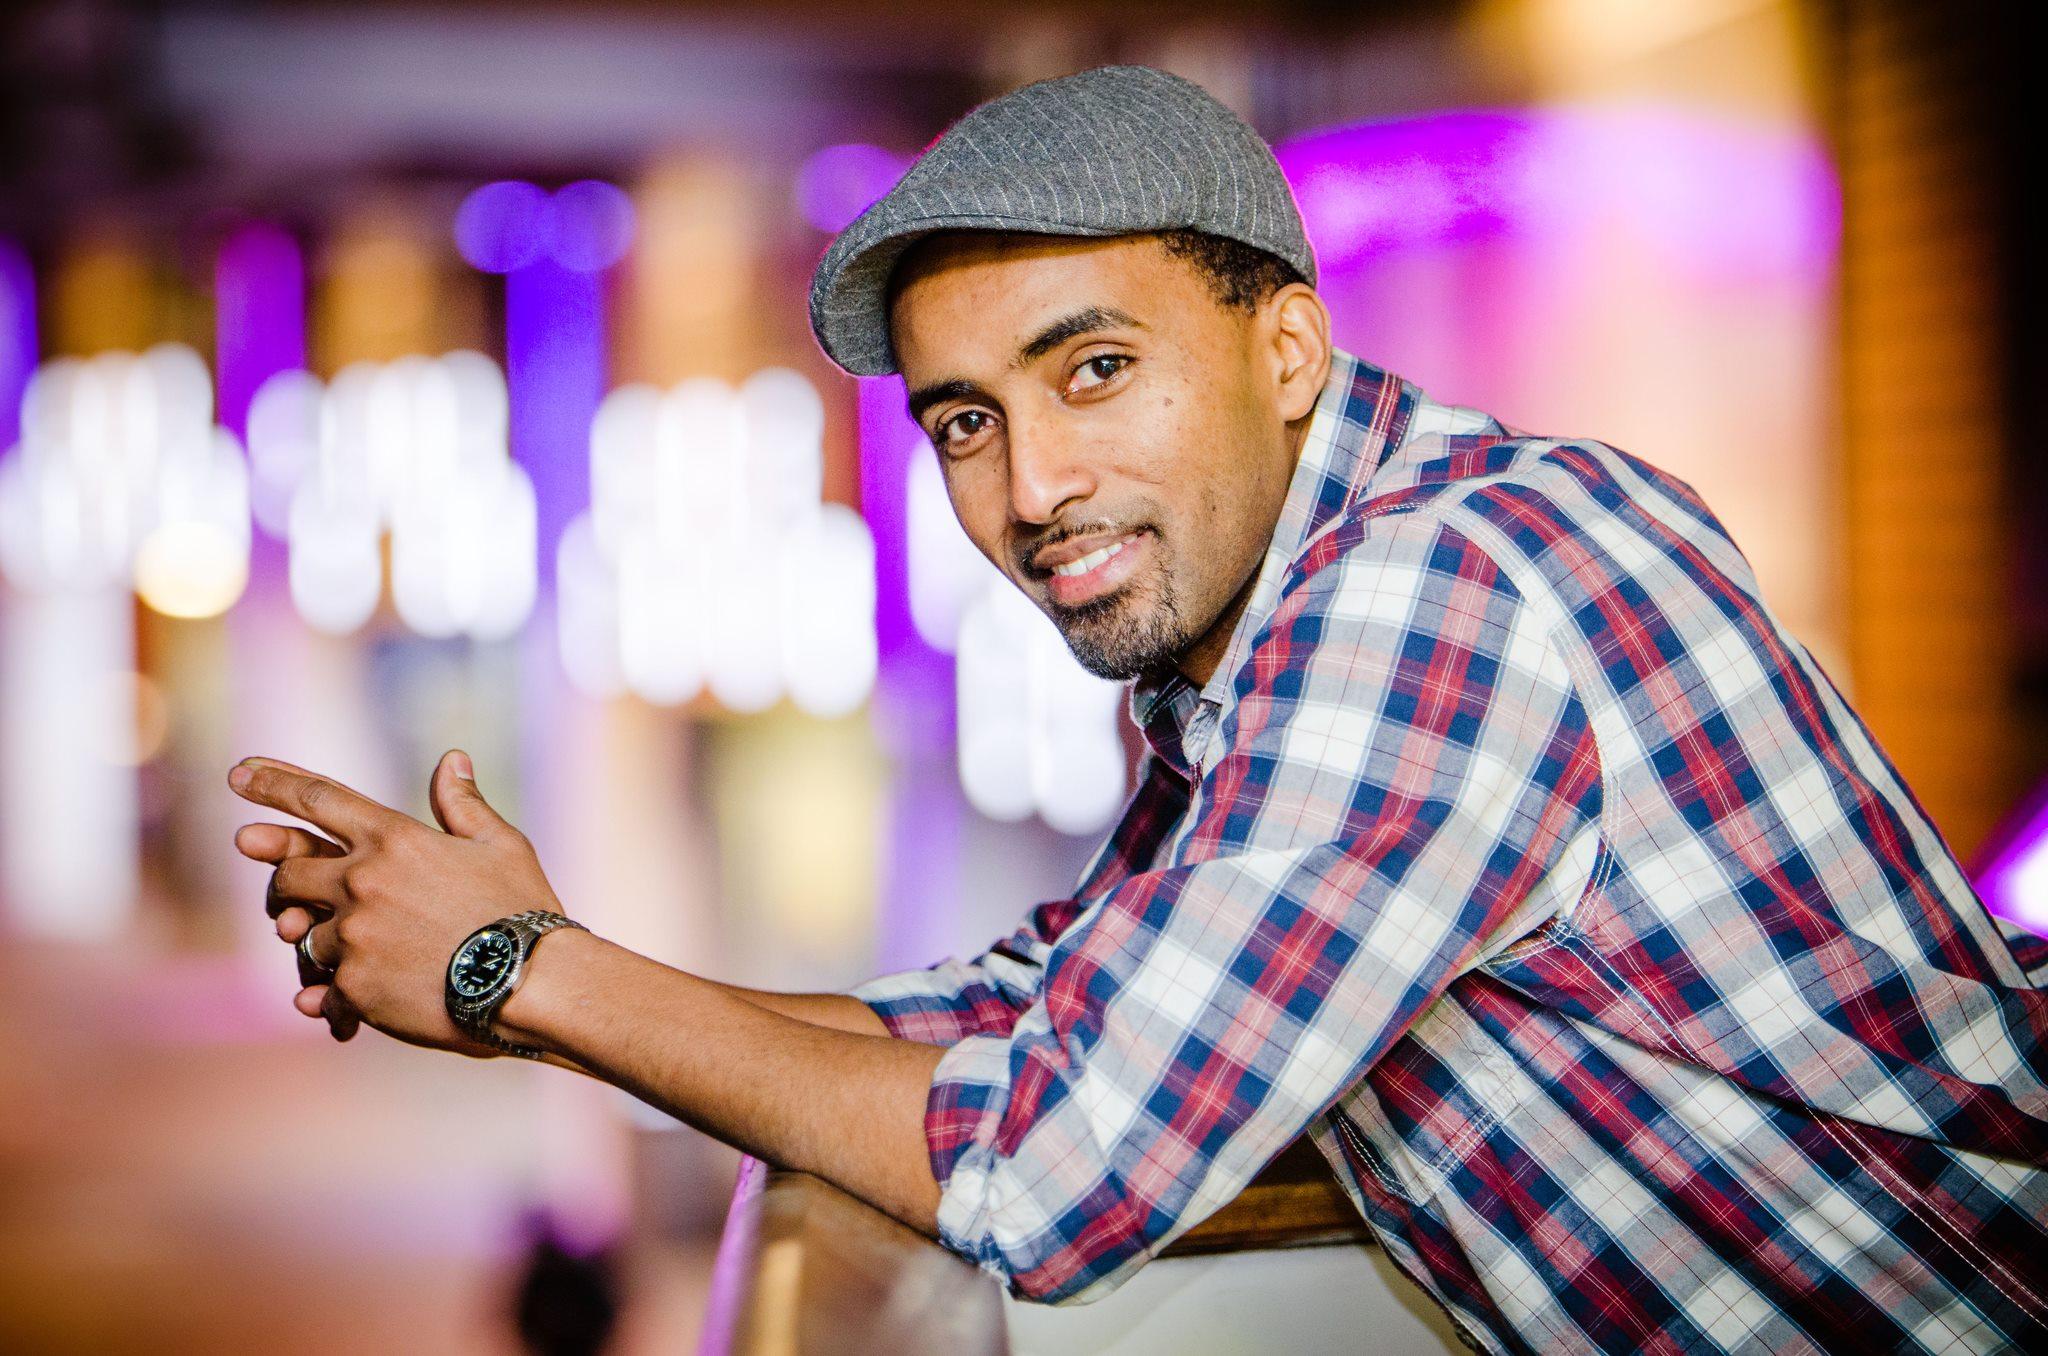 Mundo Musique: Aar Maanta Bringing Somali Music to the World